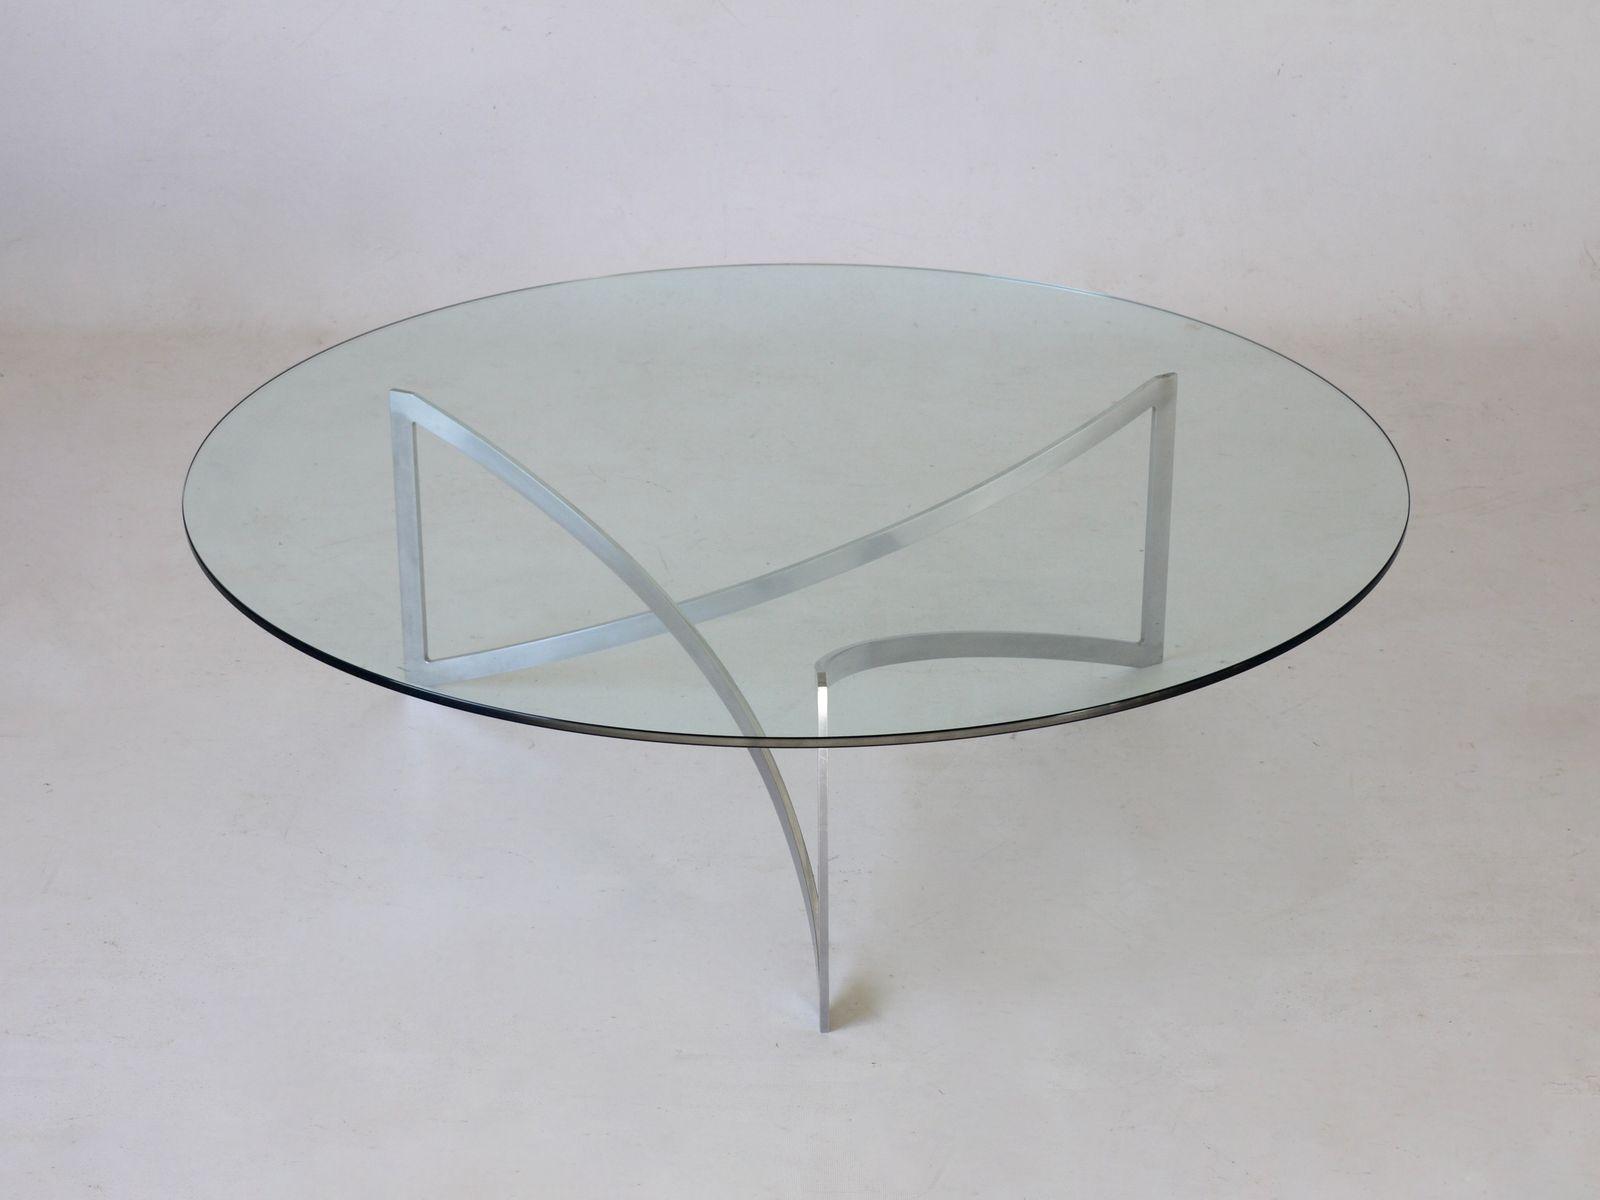 German Chrome & Glass Coffee Table 1970s for sale at Pamono